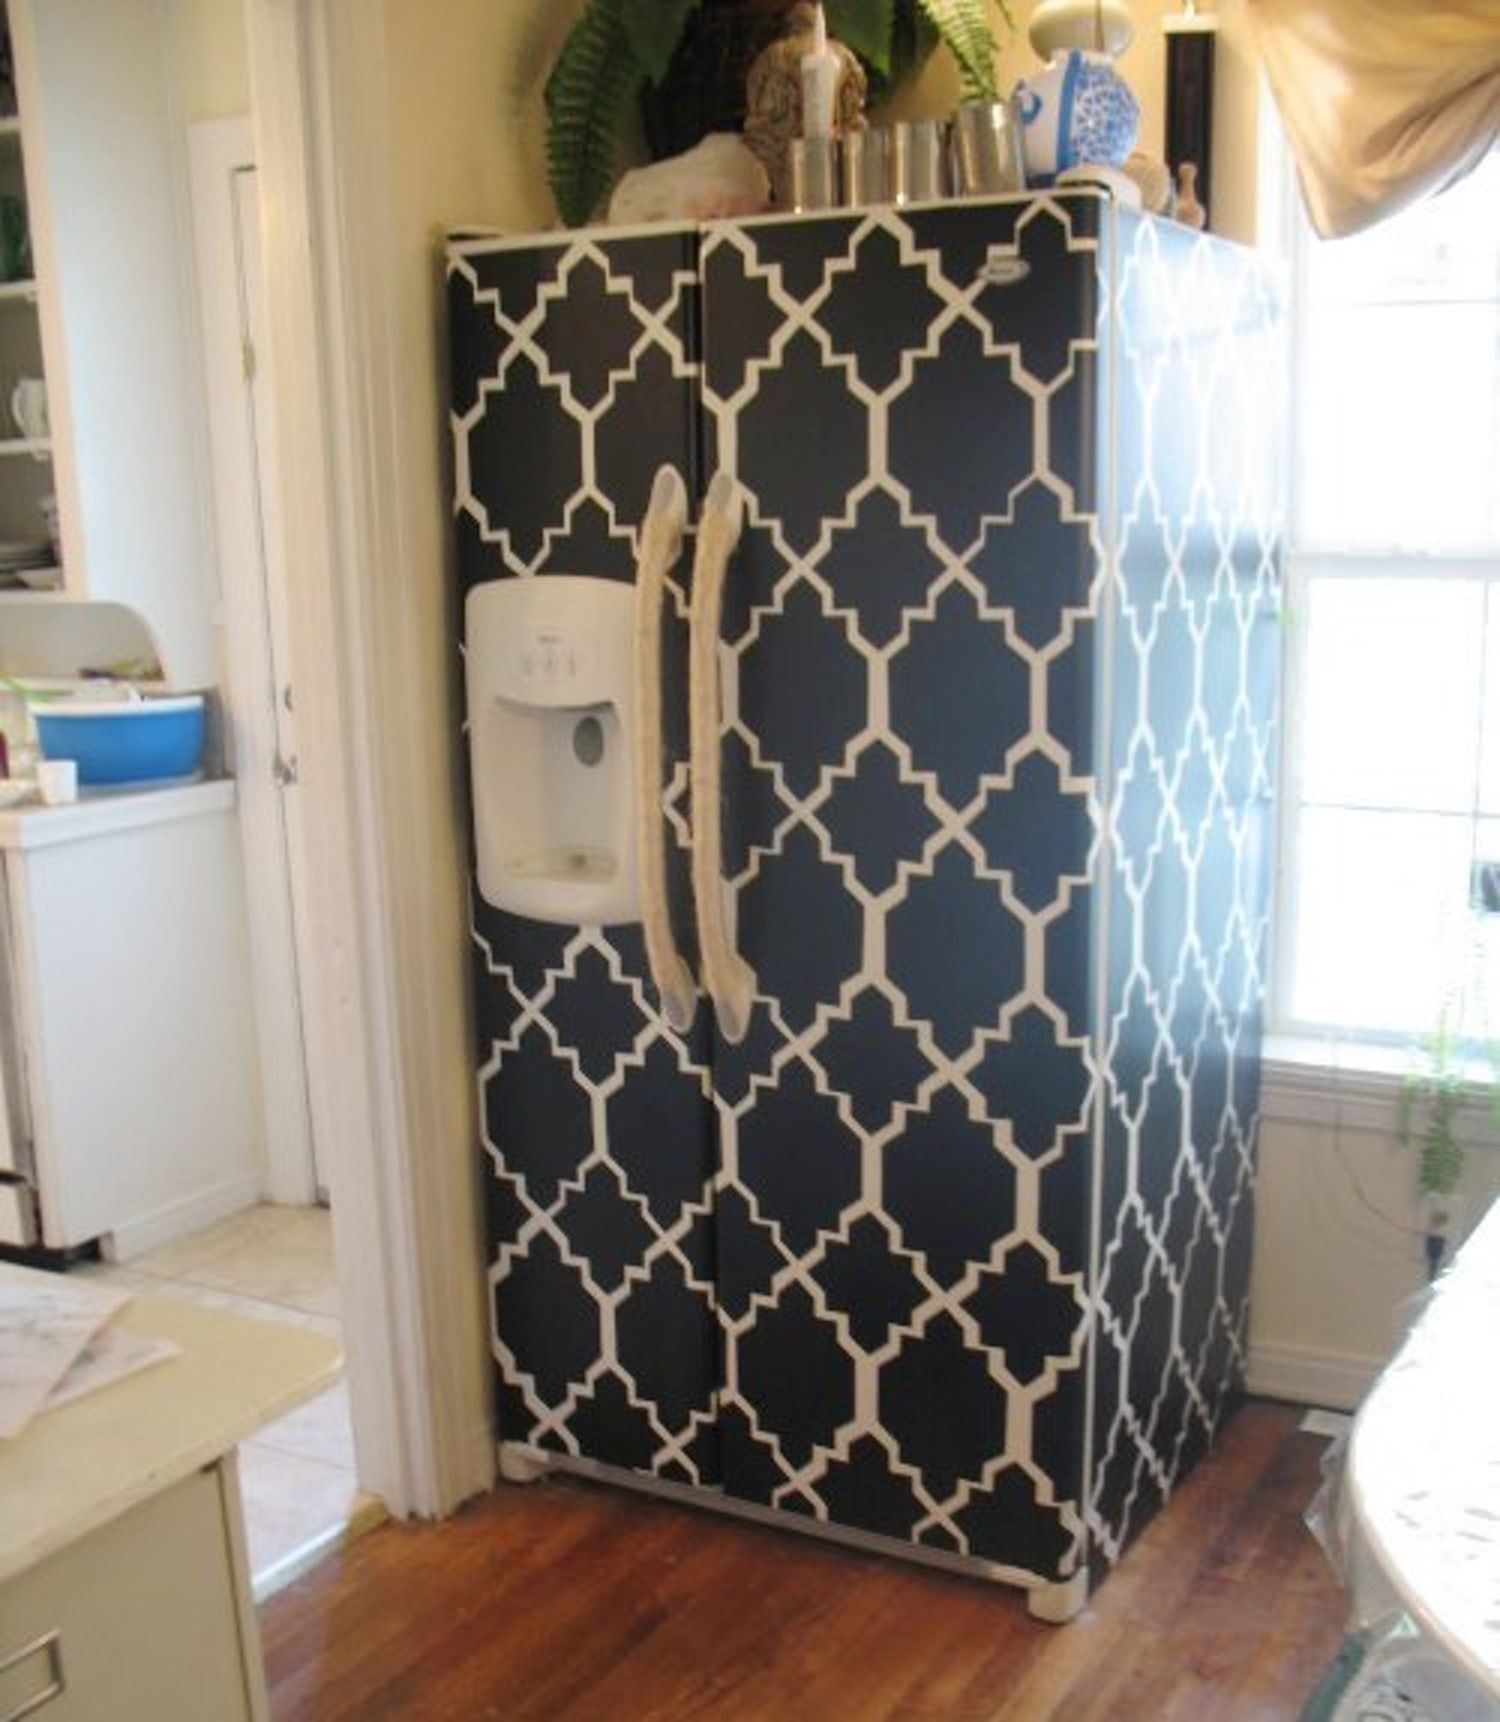 DIY Refrigerator Design: Contact Paper Pattern | DIY and crafts ...